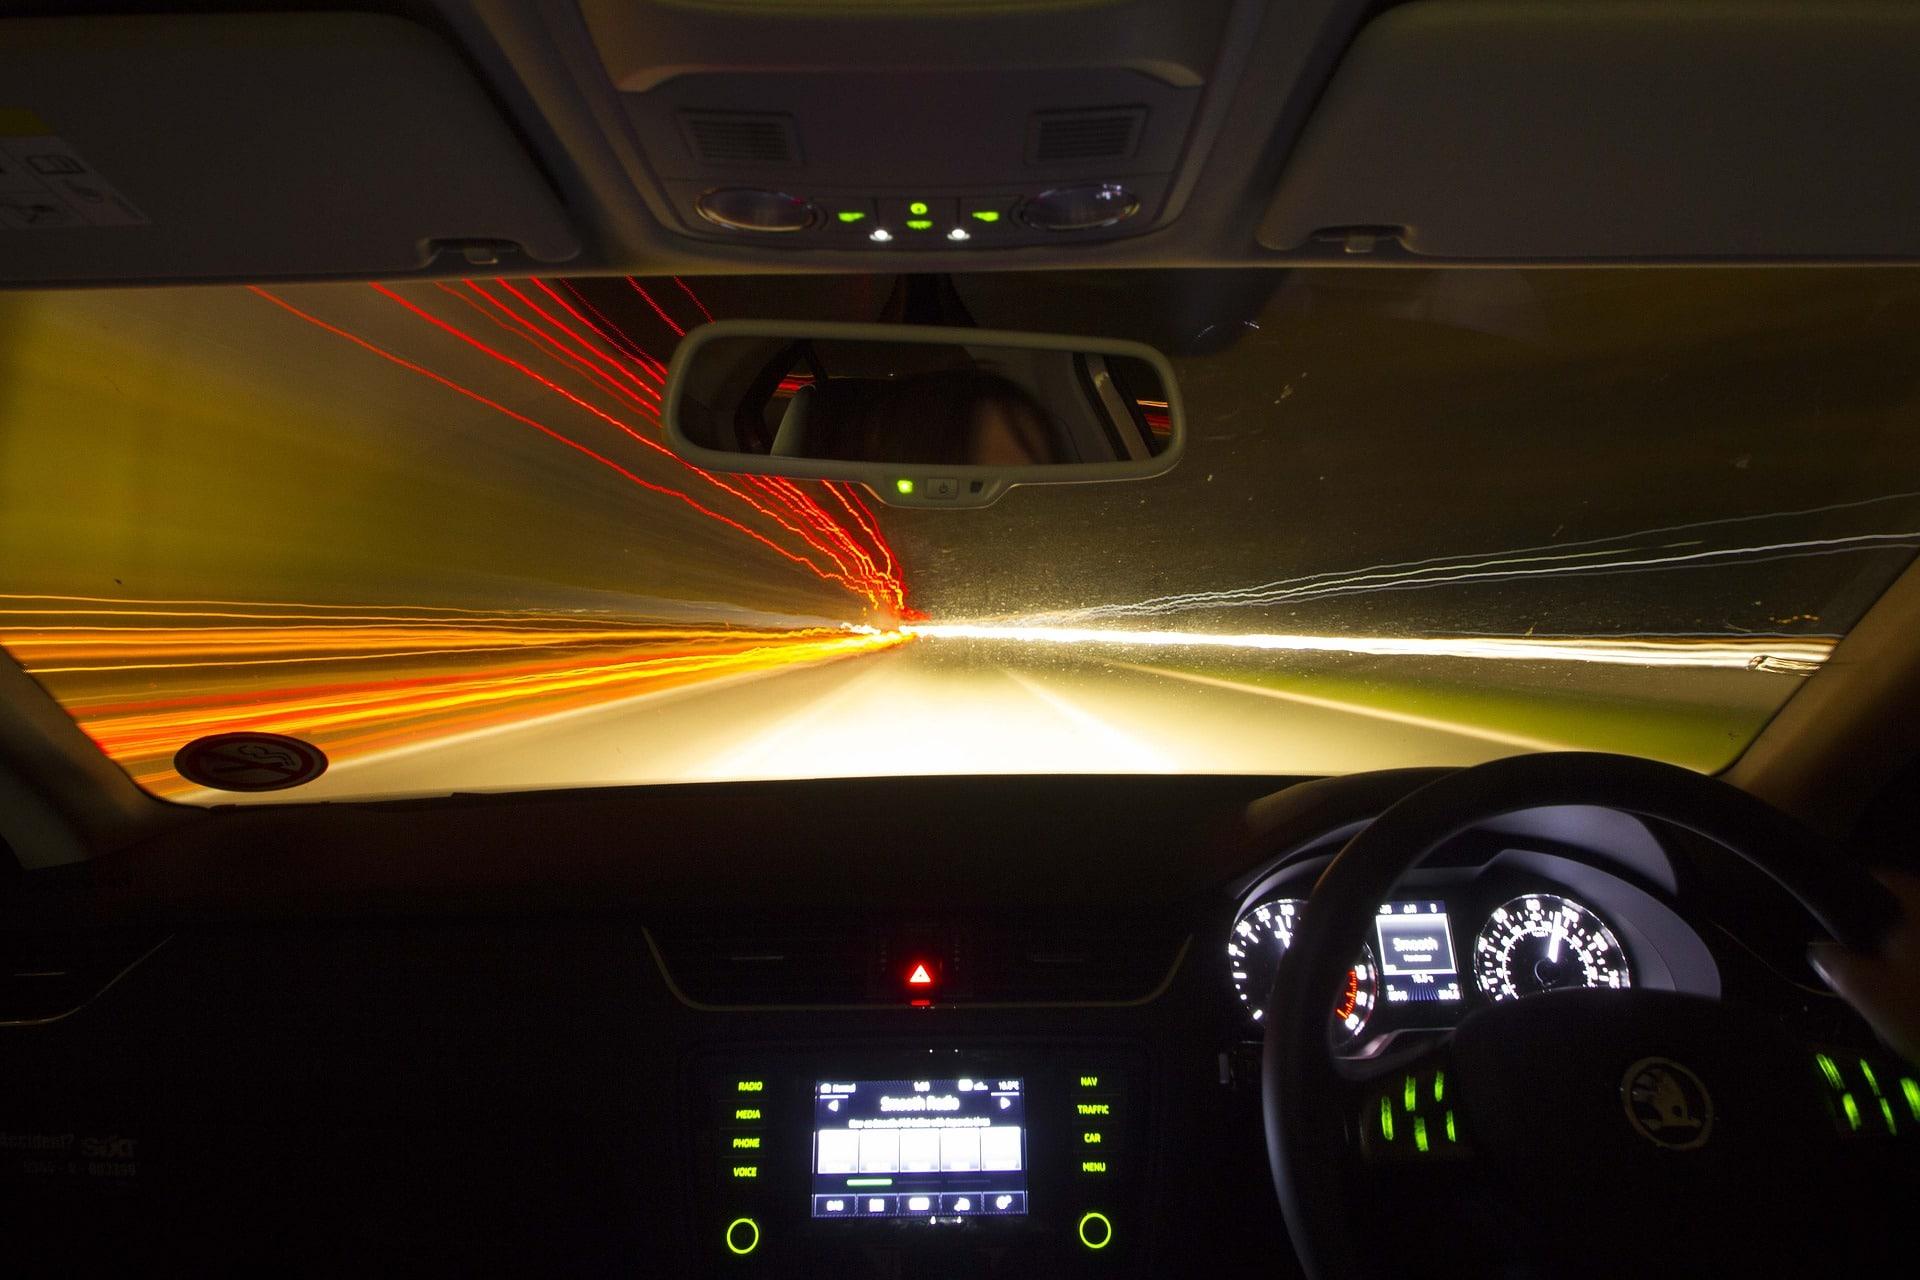 arizona reckless driving laws - car speeding